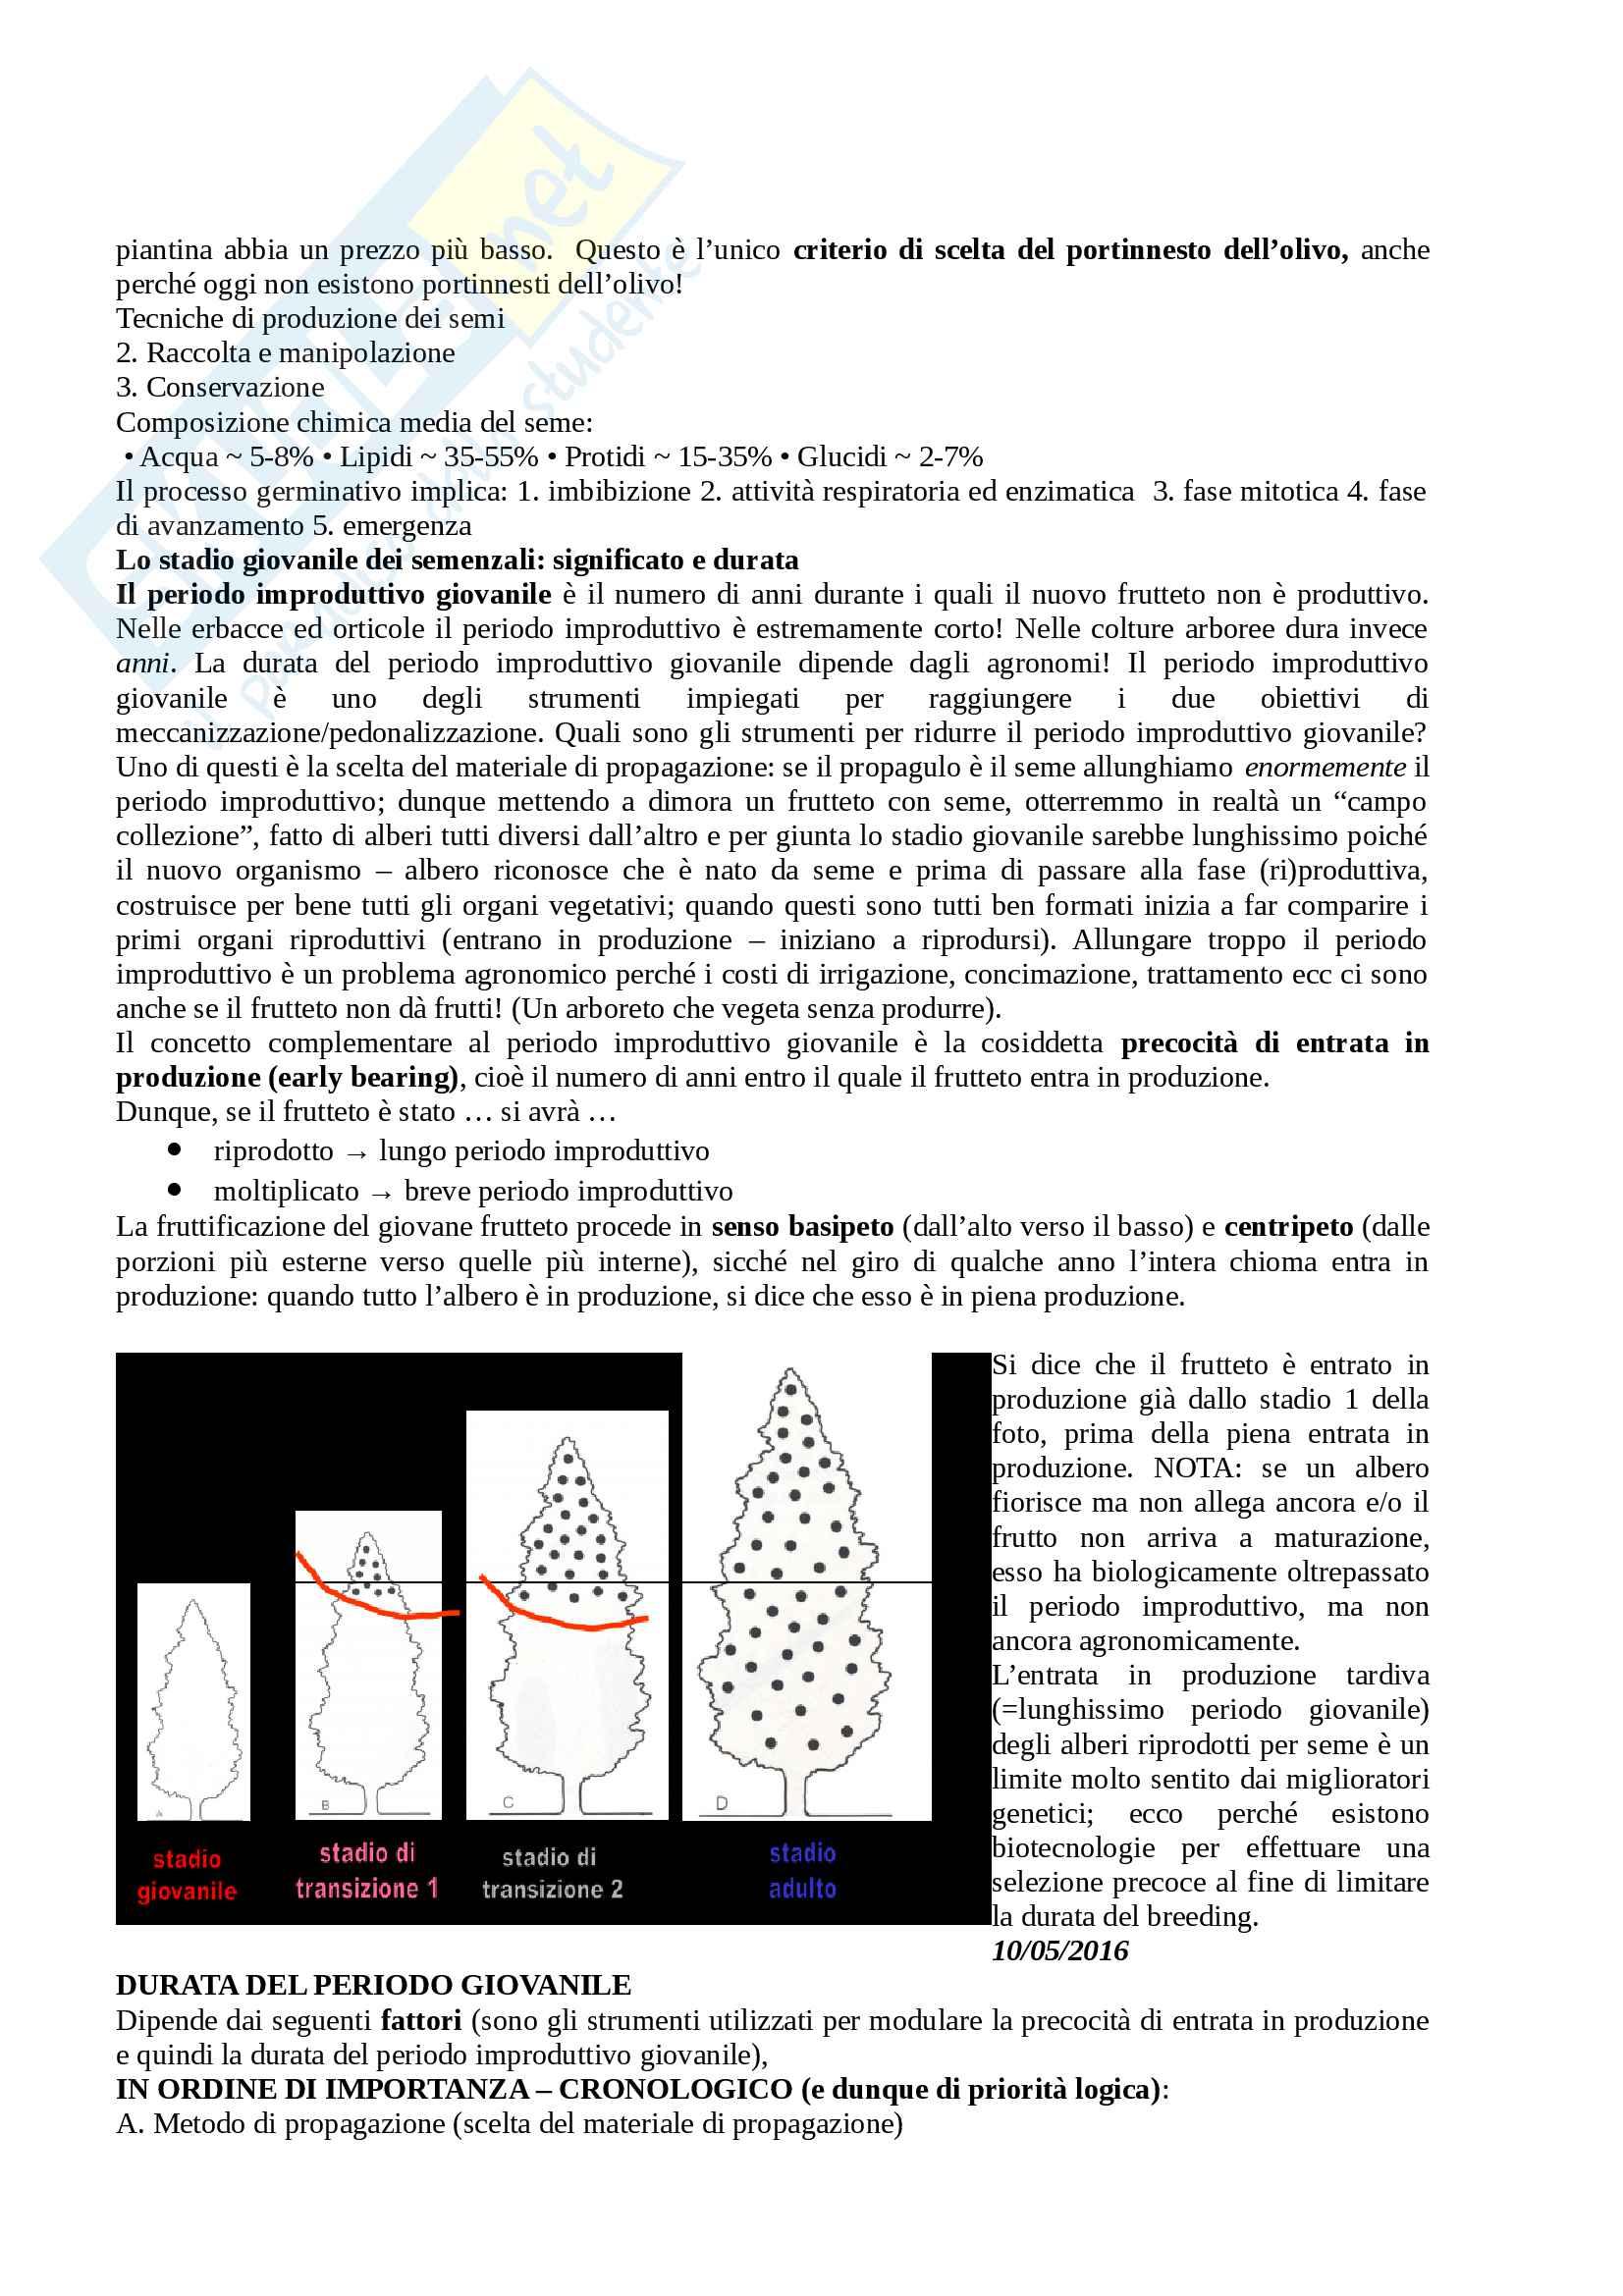 Arboricoltura - seconda parte Pag. 2